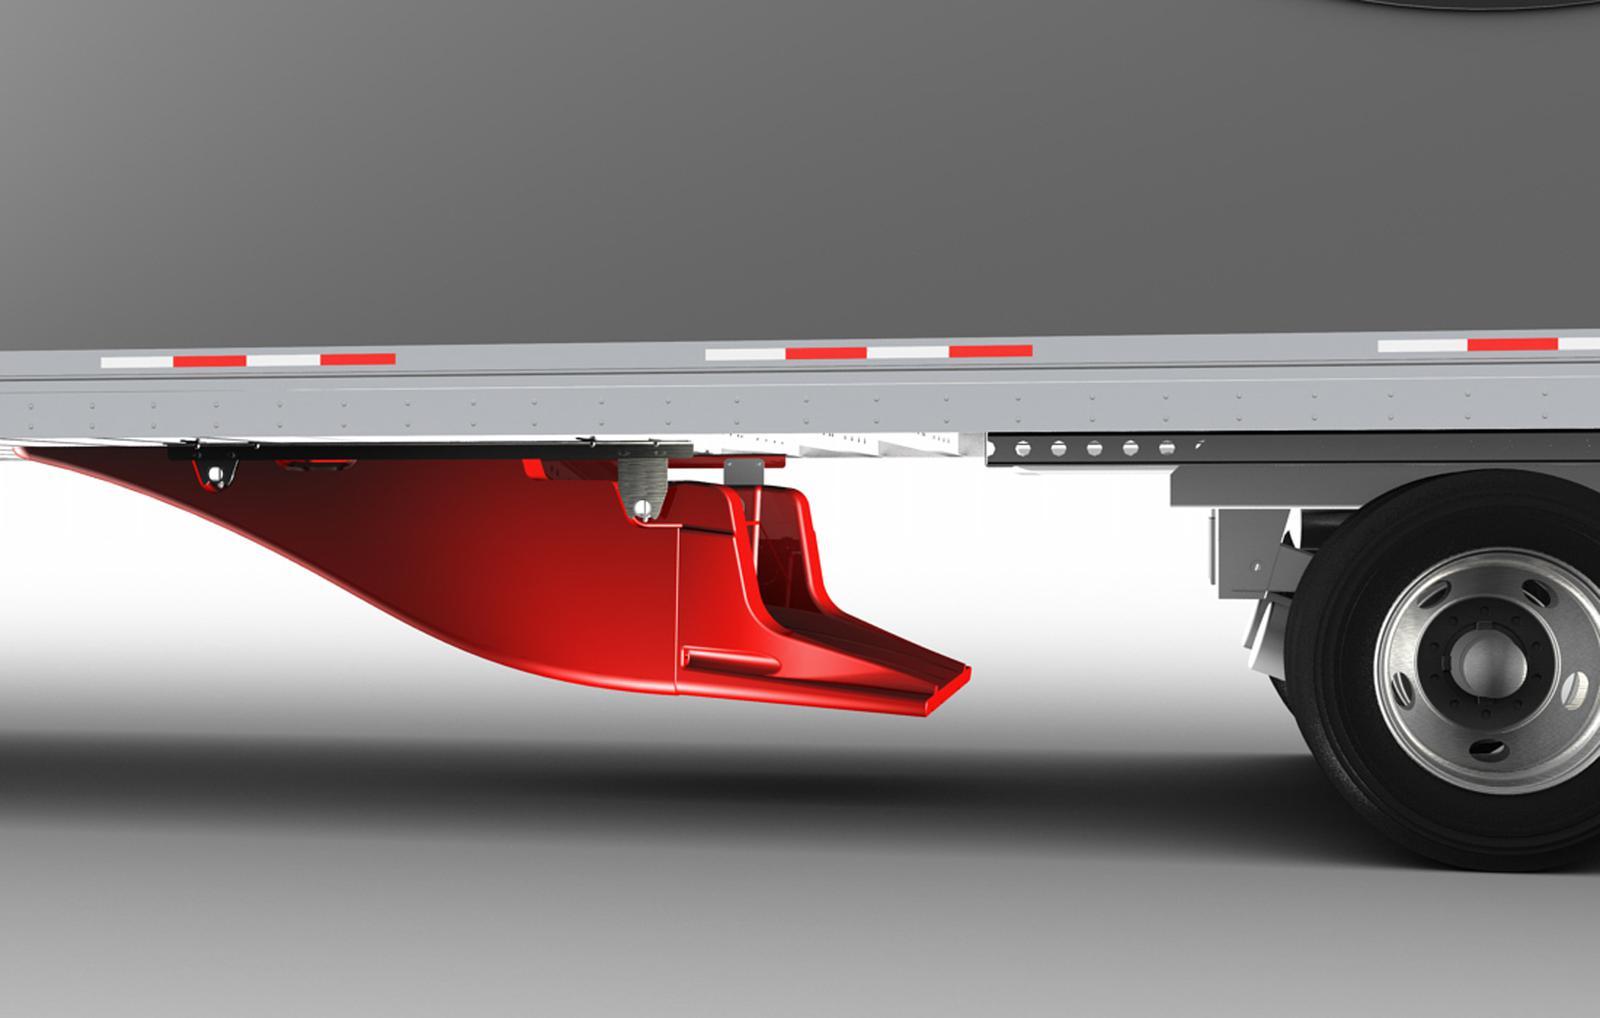 Aerodynamic Tractor Trailer : Smart truck aerodynamic systems thermo king northwest